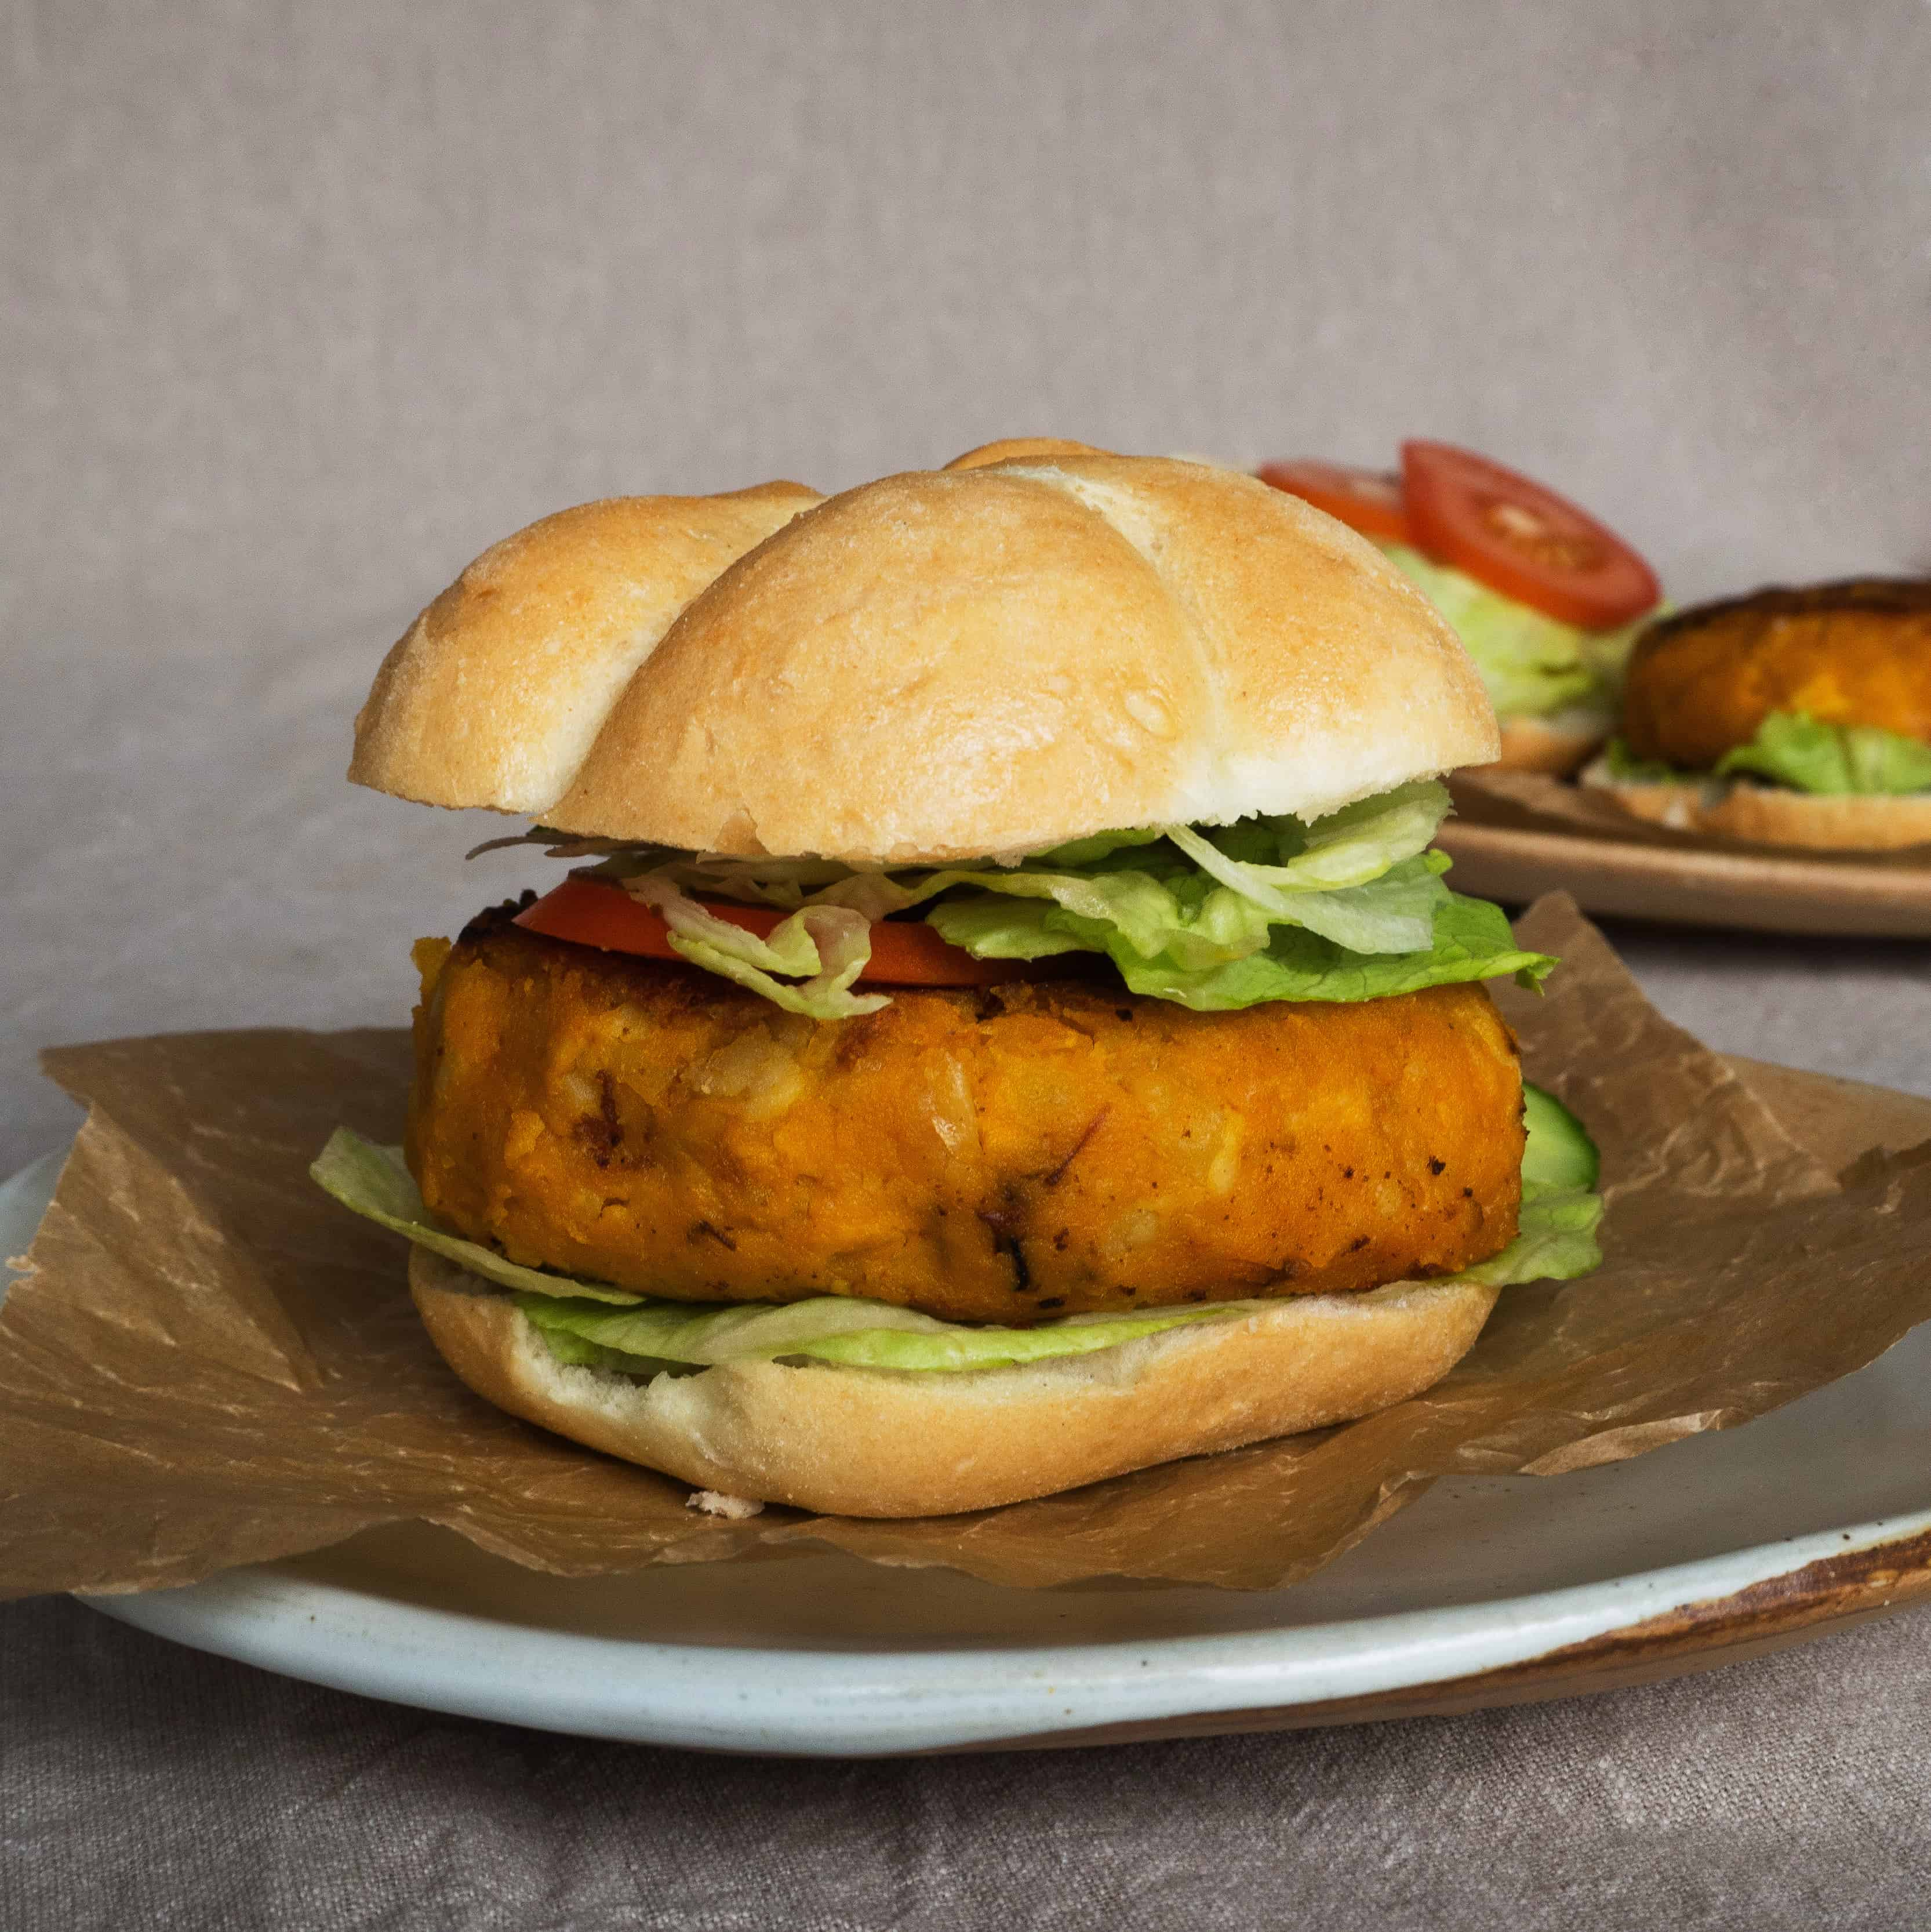 Gluten-Free, Vegan Chickpea and Pumpkin Burger. Ready to eat.